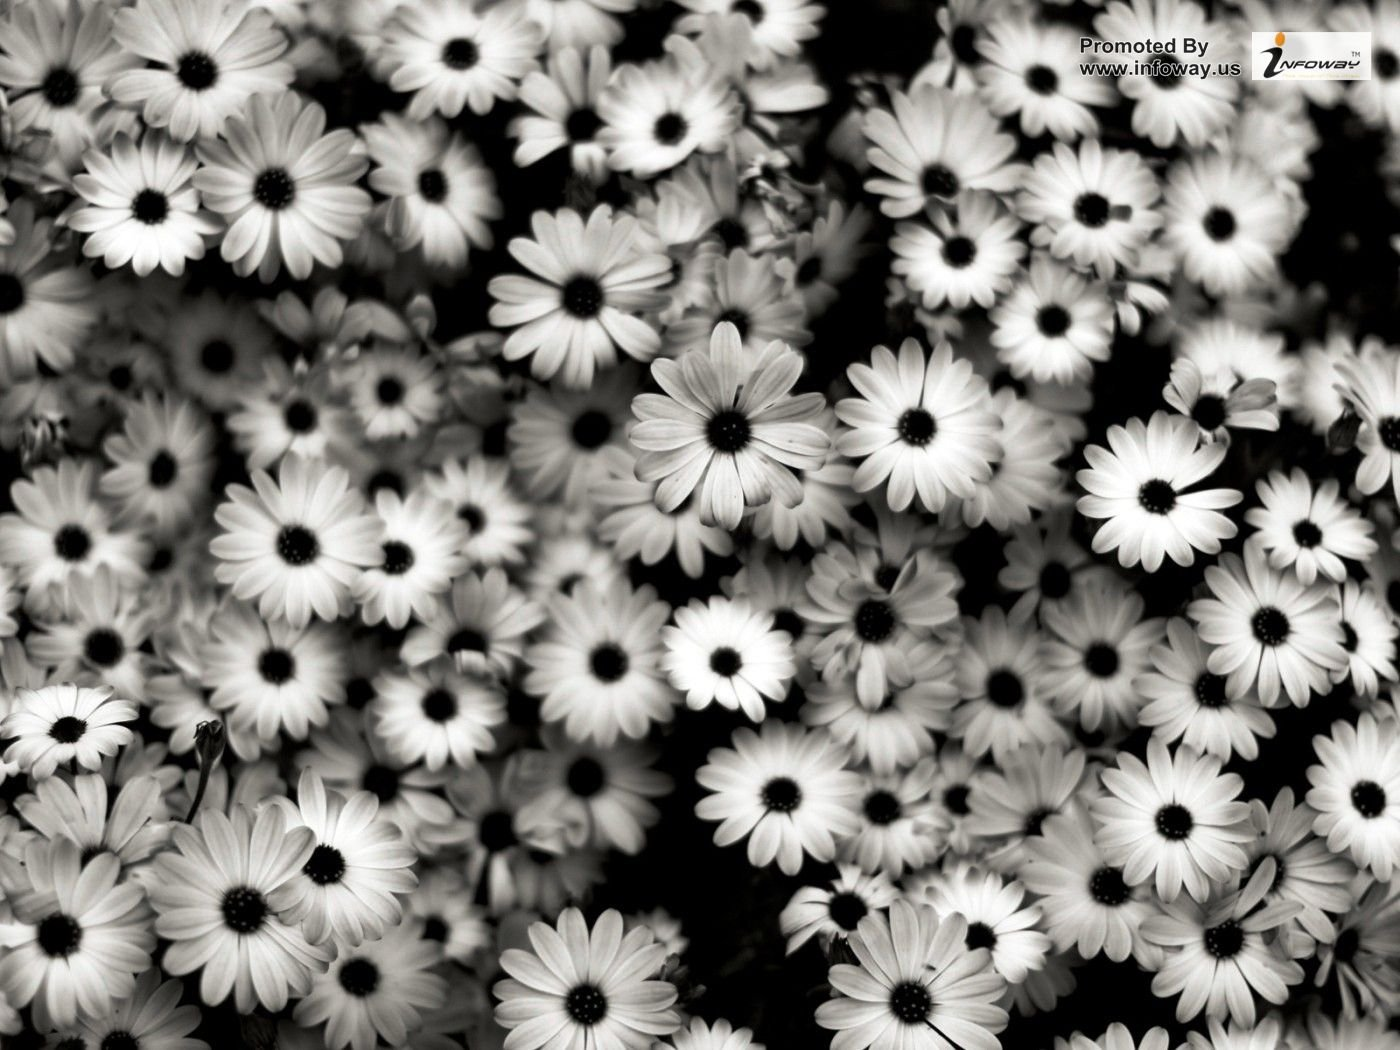 flowers flower backgrounds nature wallpapers cool laptop wallpapersafari hdflowerwallpaper